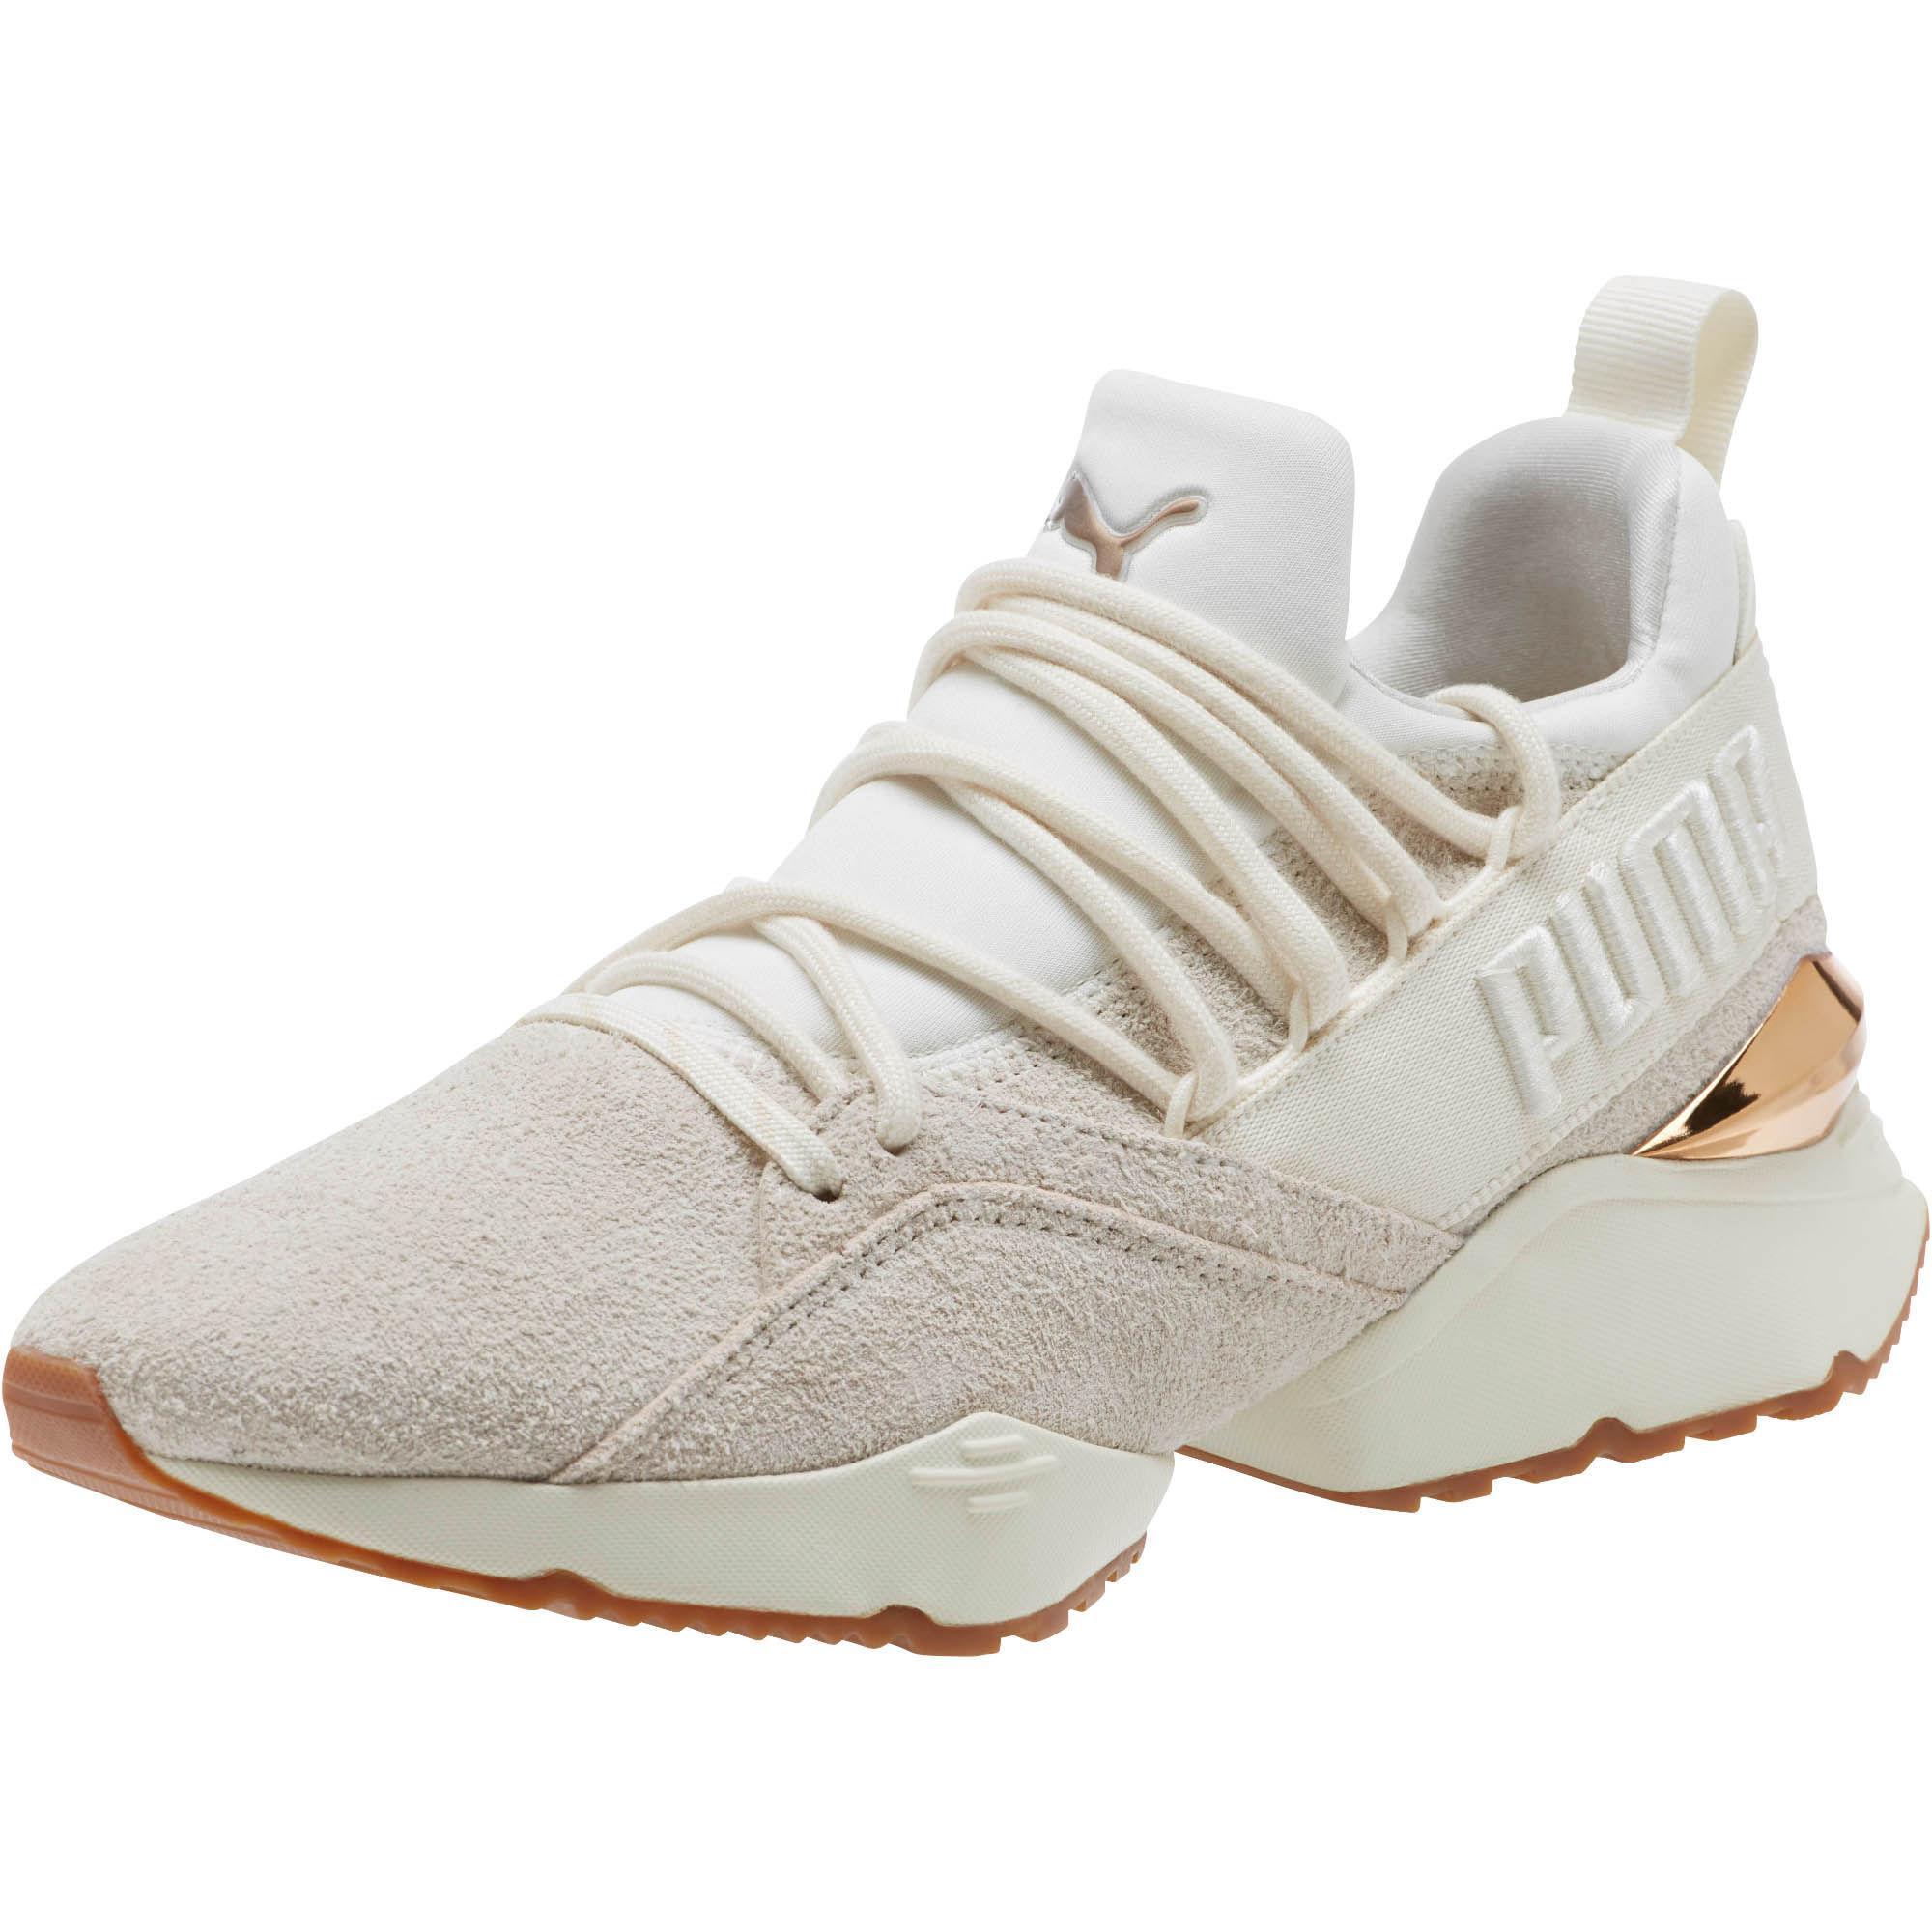 Lyst - PUMA Muse Maia Util Women s Sneakers a8ddd5103b4